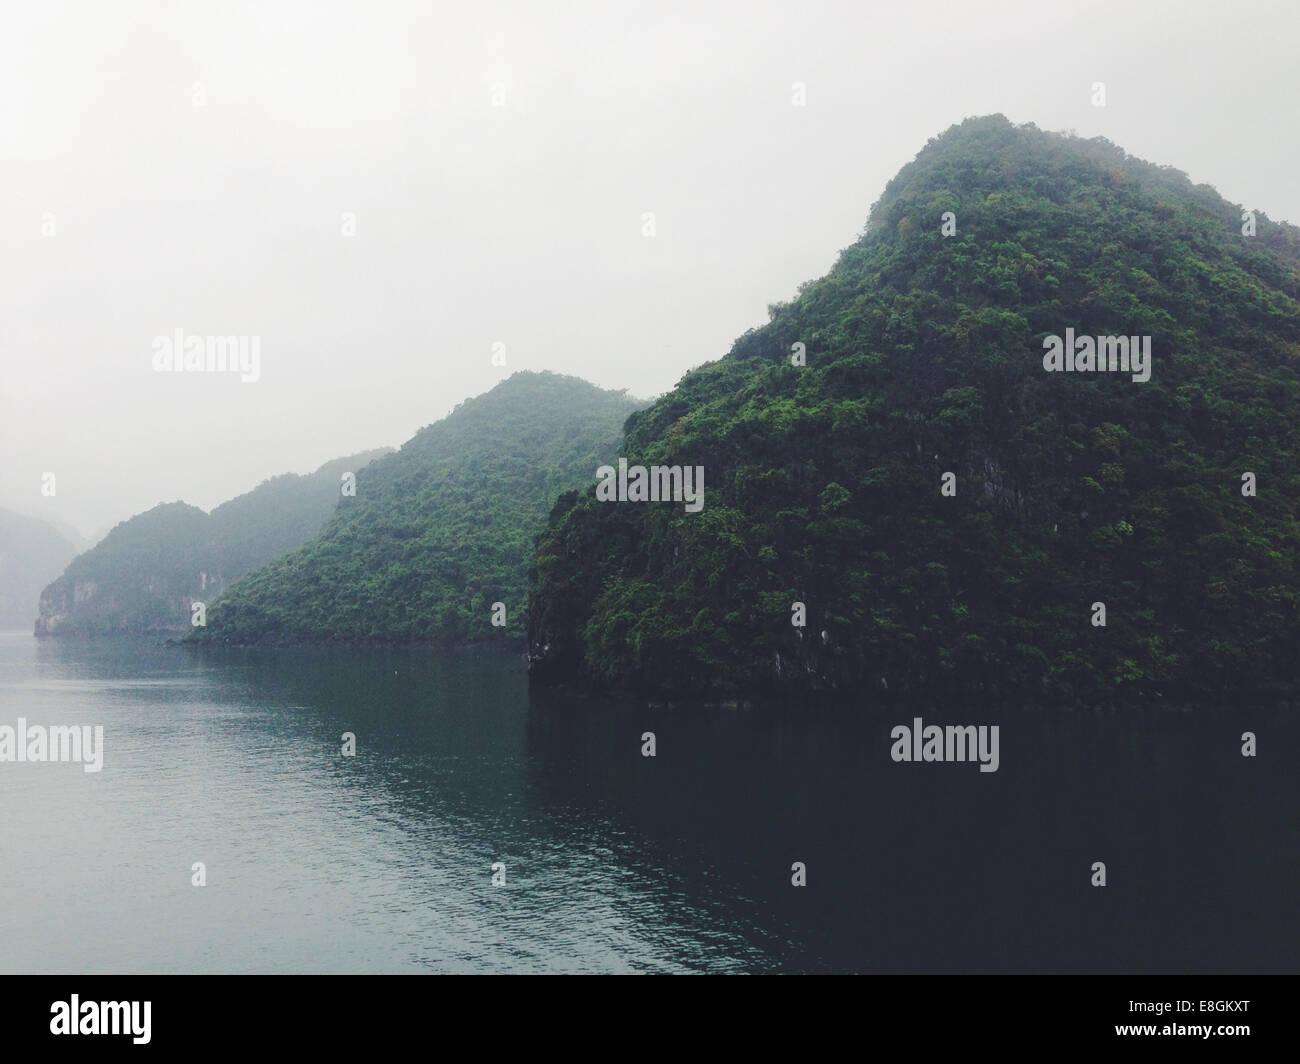 Ansicht von Kalksteininseln Stockbild